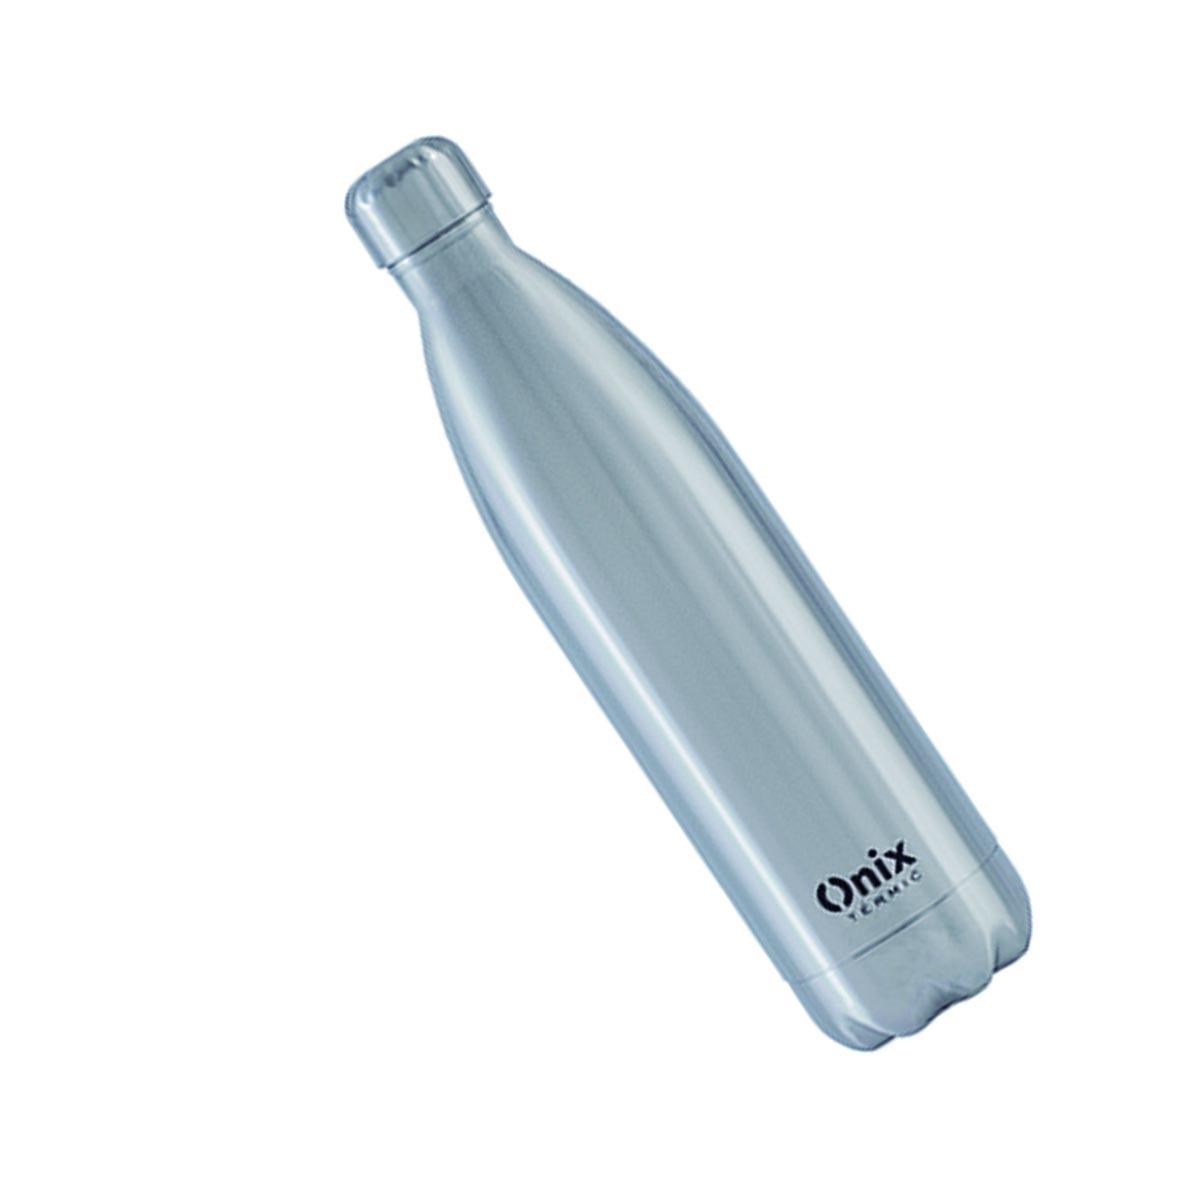 Garrafa Paramount Plásticos Aço Inox 1000 Ml